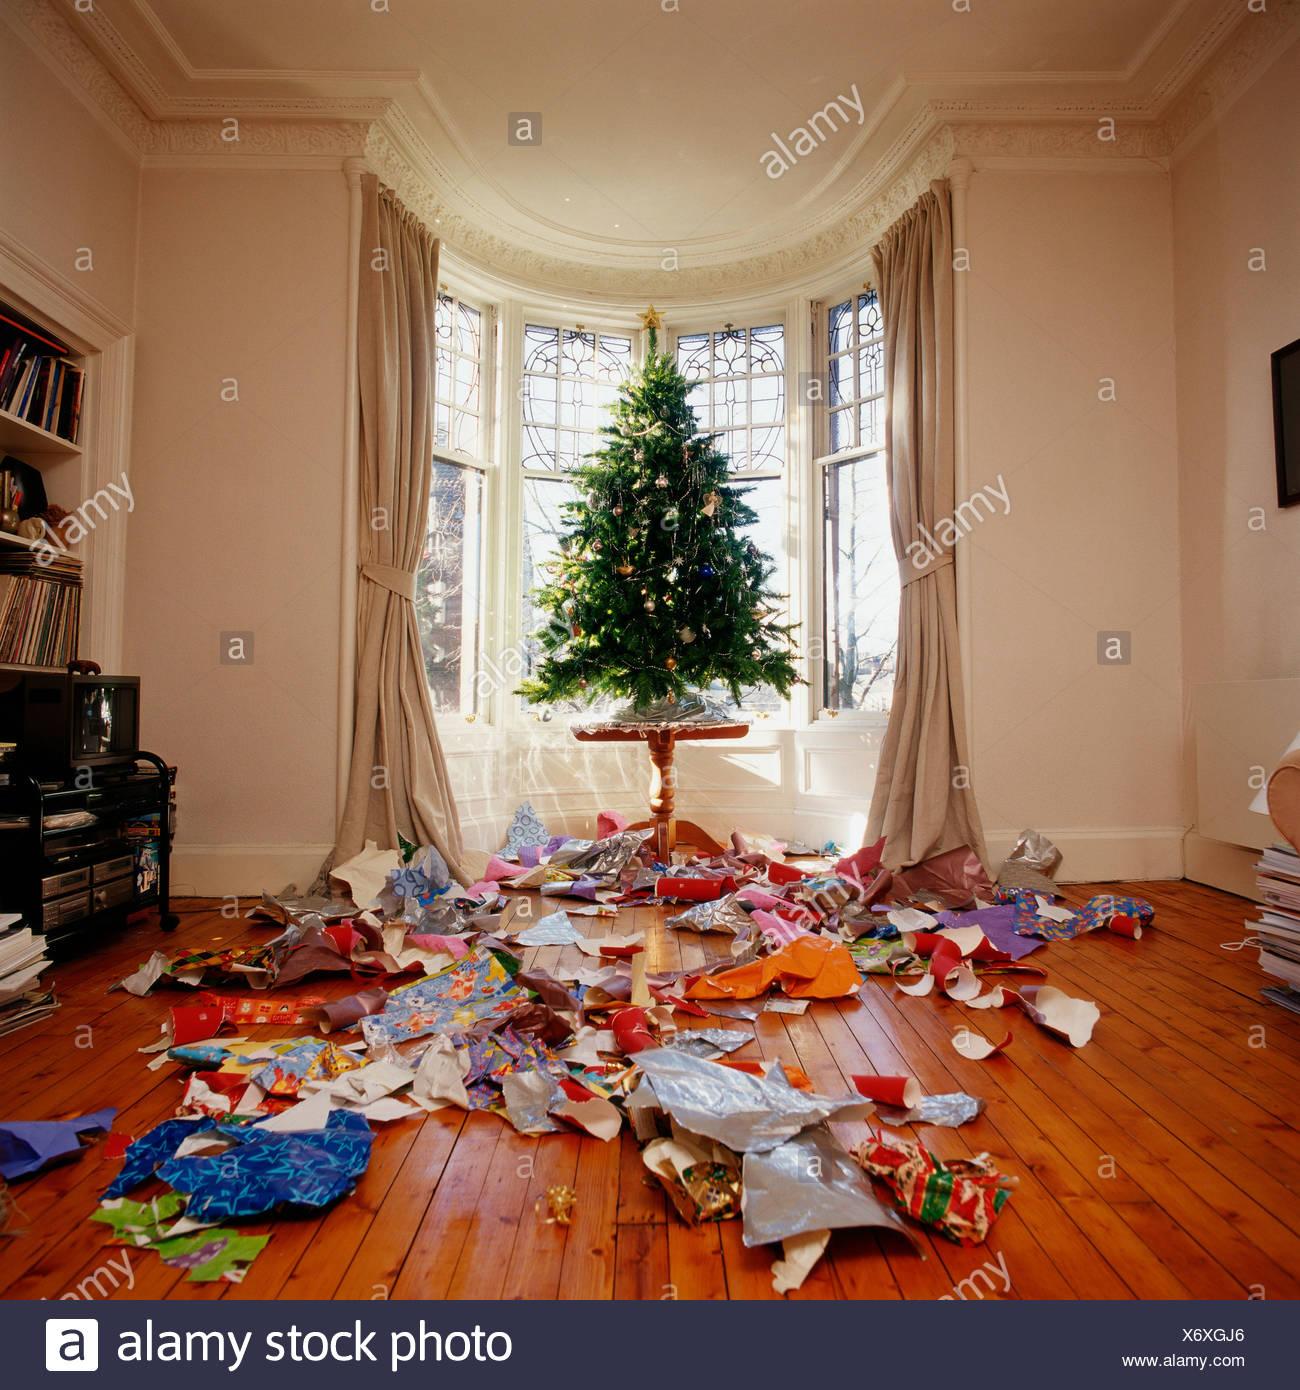 Messy Living Room: Messy Living Room At Christmas Stock Photo: 279637630